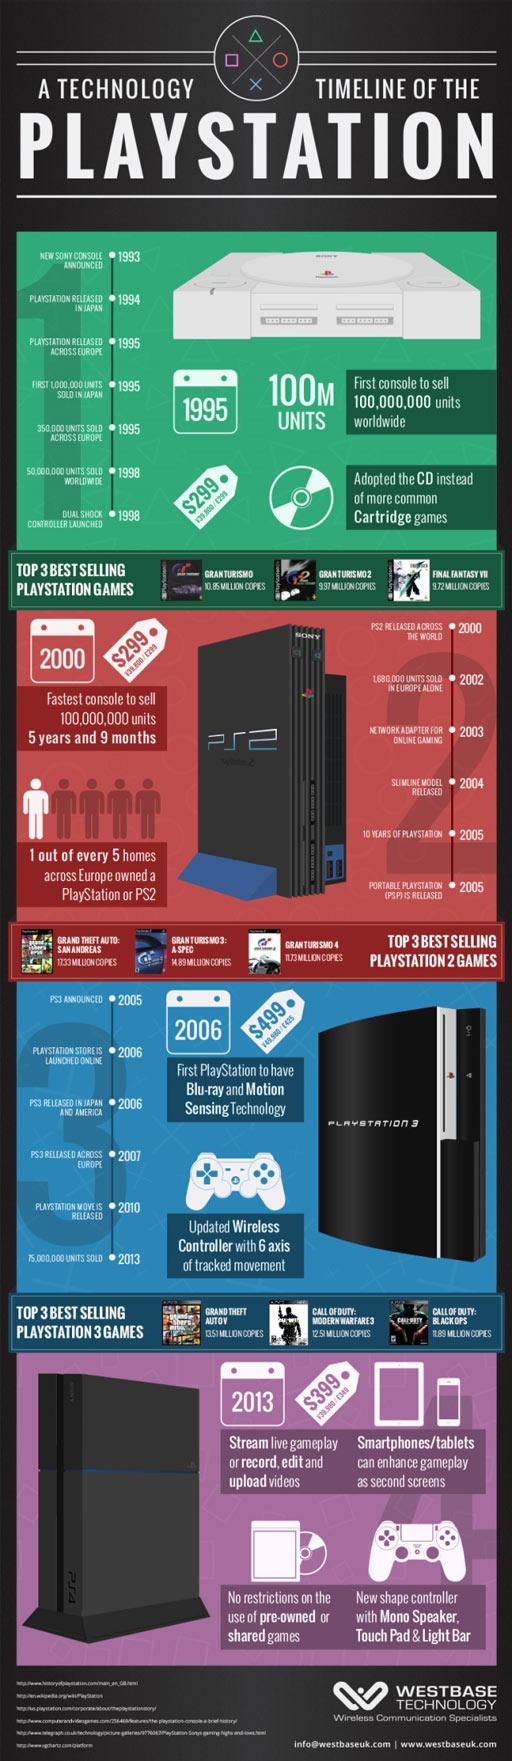 PlaystationInfographic-history